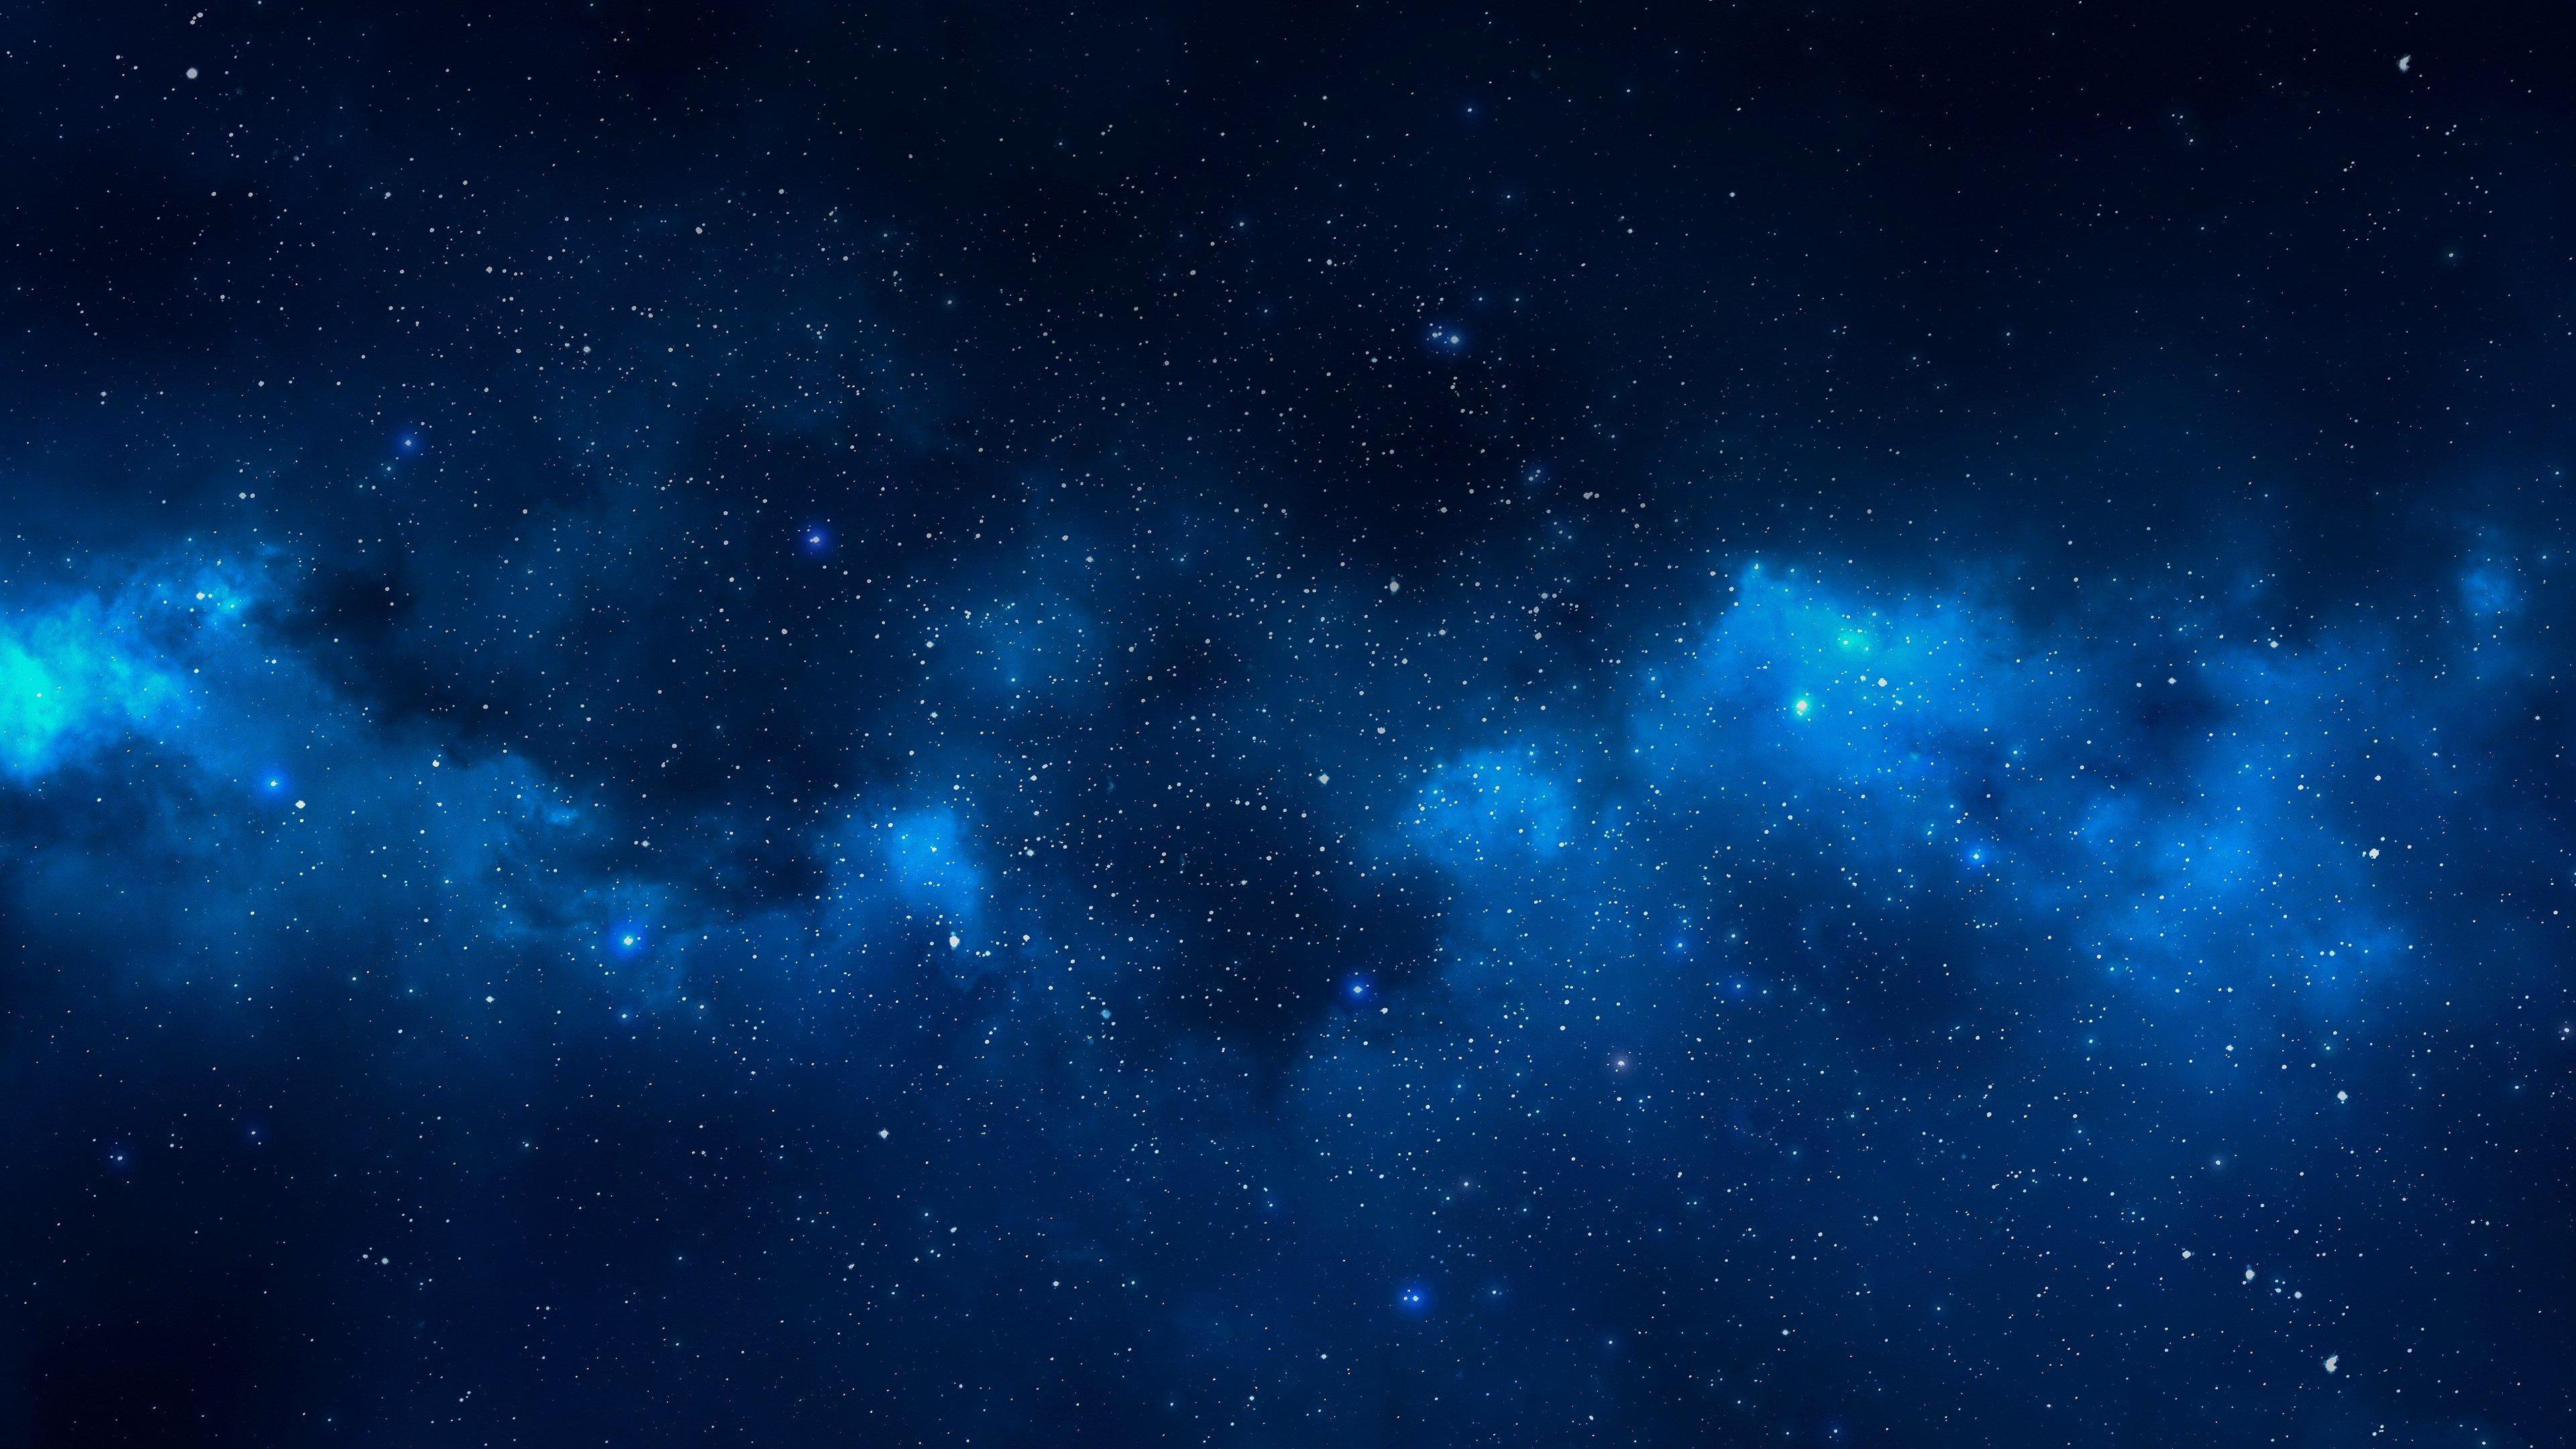 Wallpaper S Name 3840x2160 Stars 4k Computer Wallpaper Hd Free Download Resolution 3840x2160 Fi In 2021 Galaxy Wallpaper 1920x1080 Galaxy Wallpaper Wallpaper Gallery Aesthetic galaxy desktop wallpaper hd